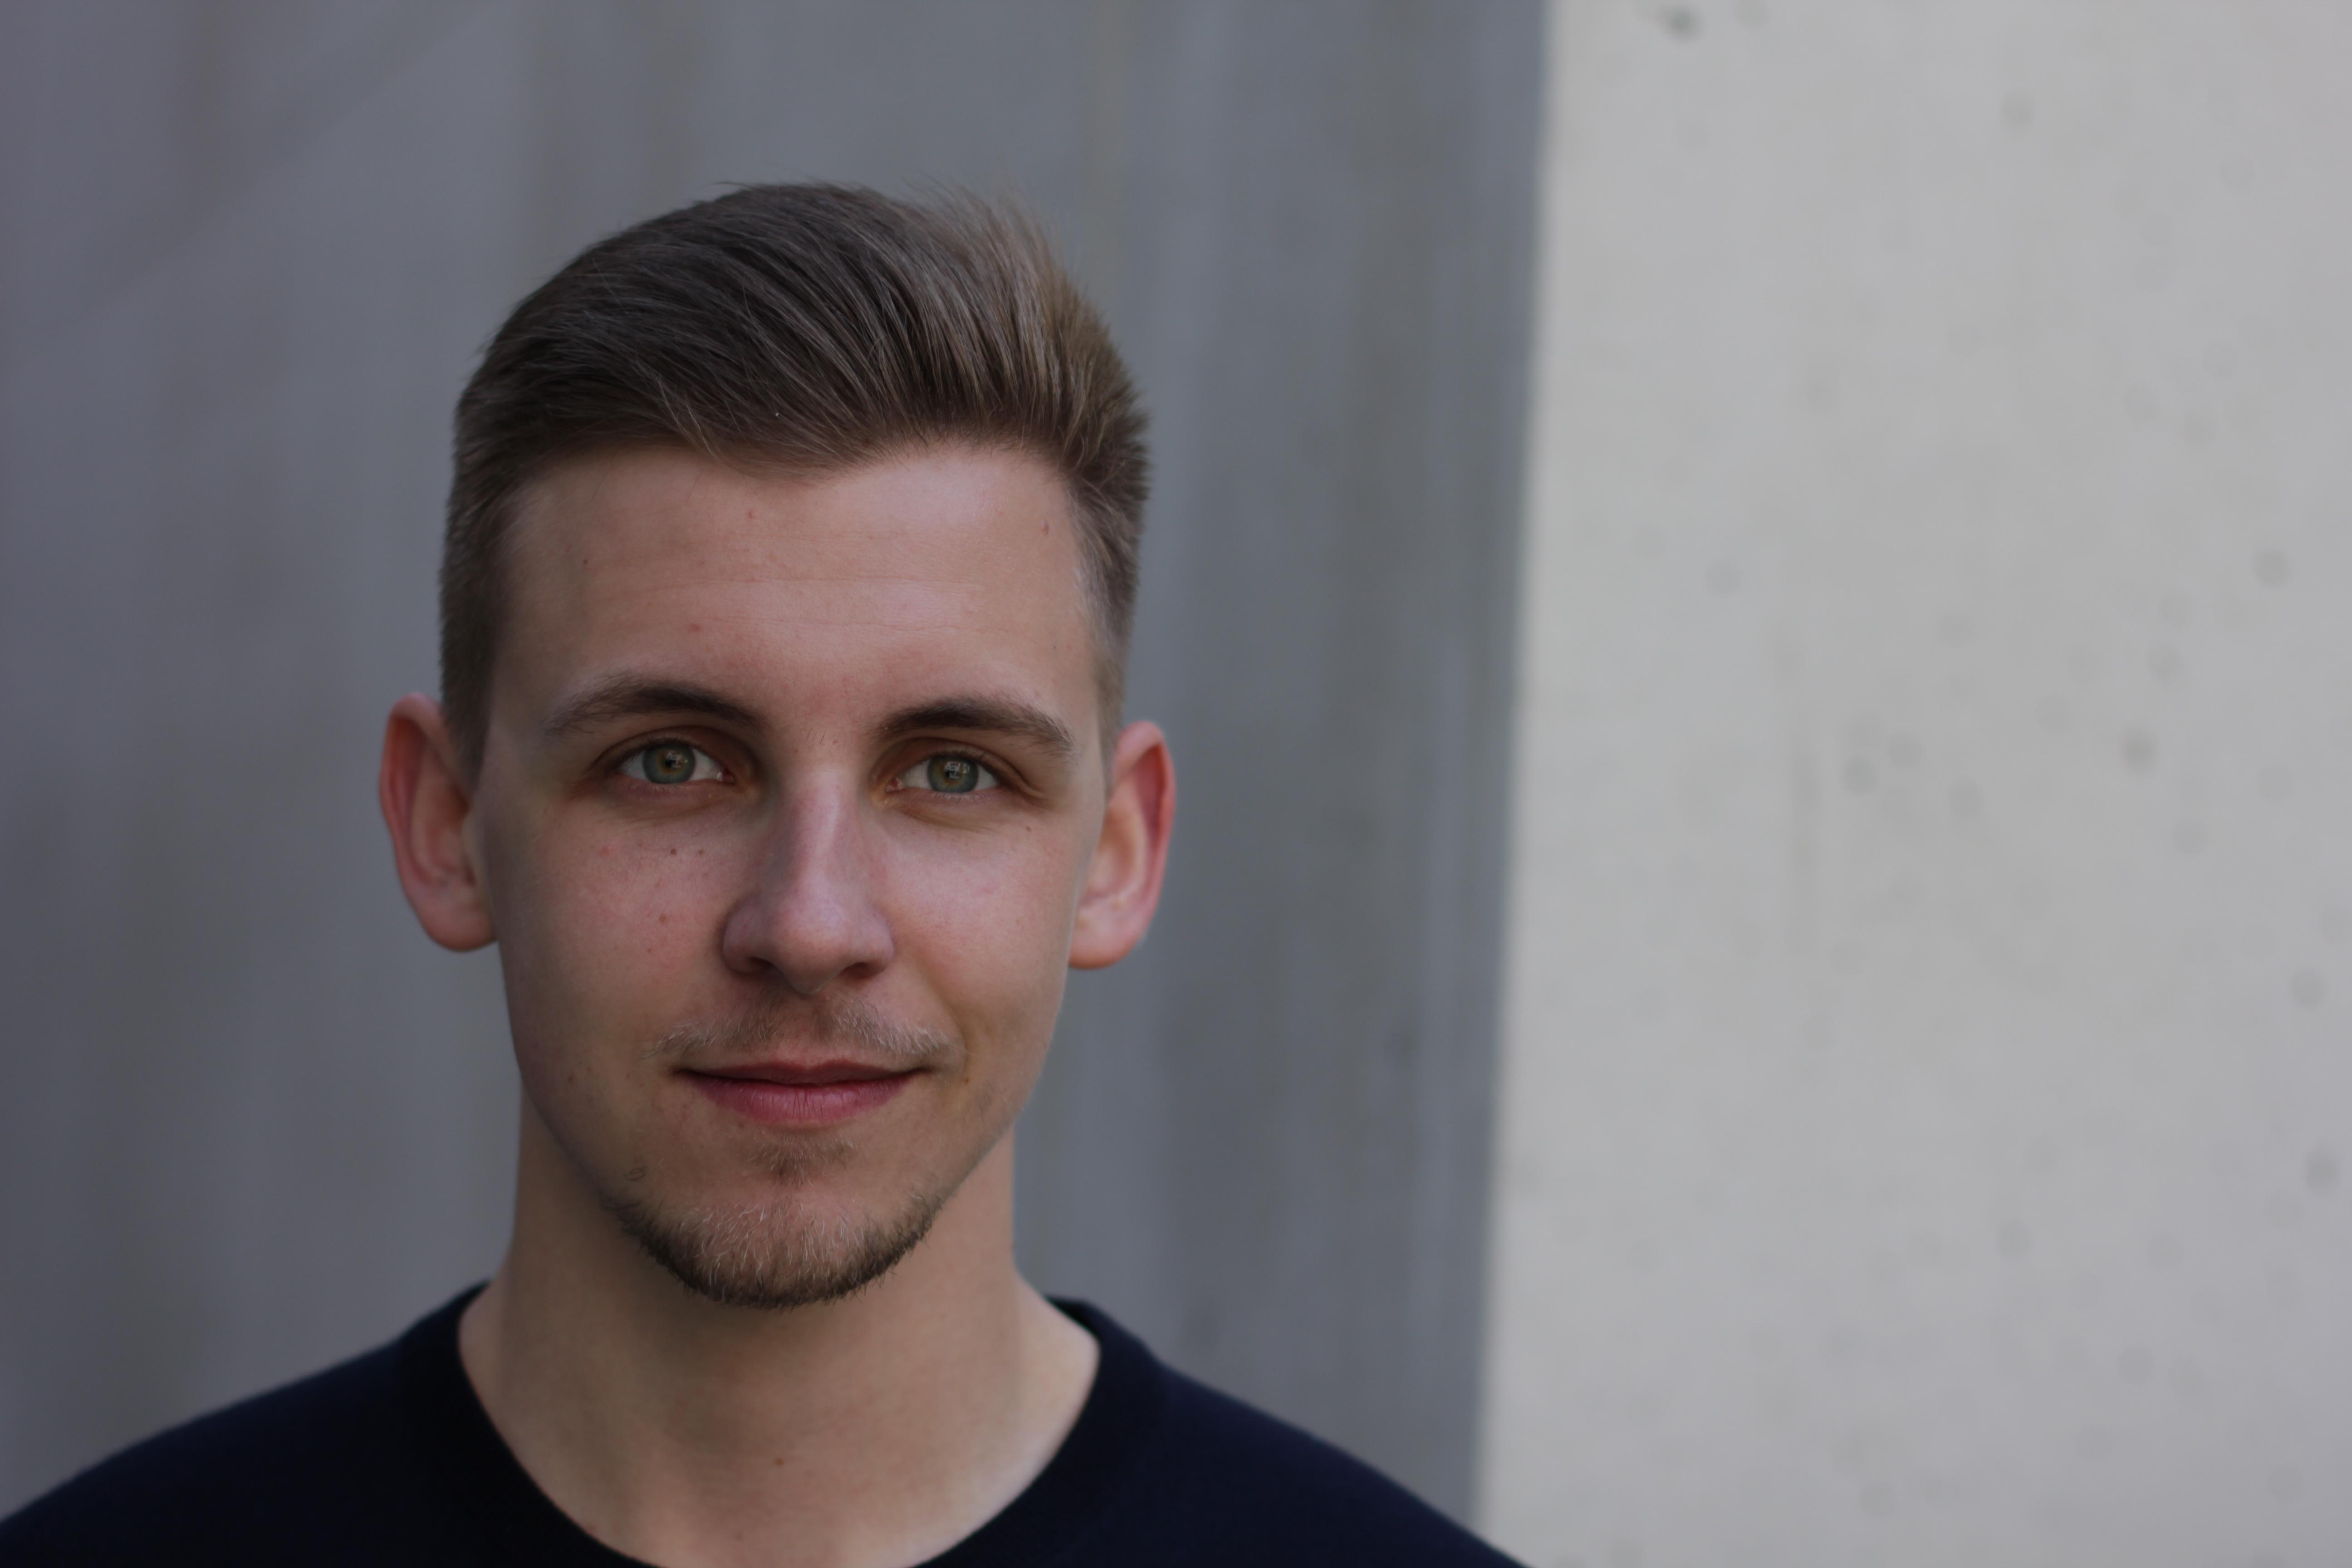 Portrait von Paul Berg